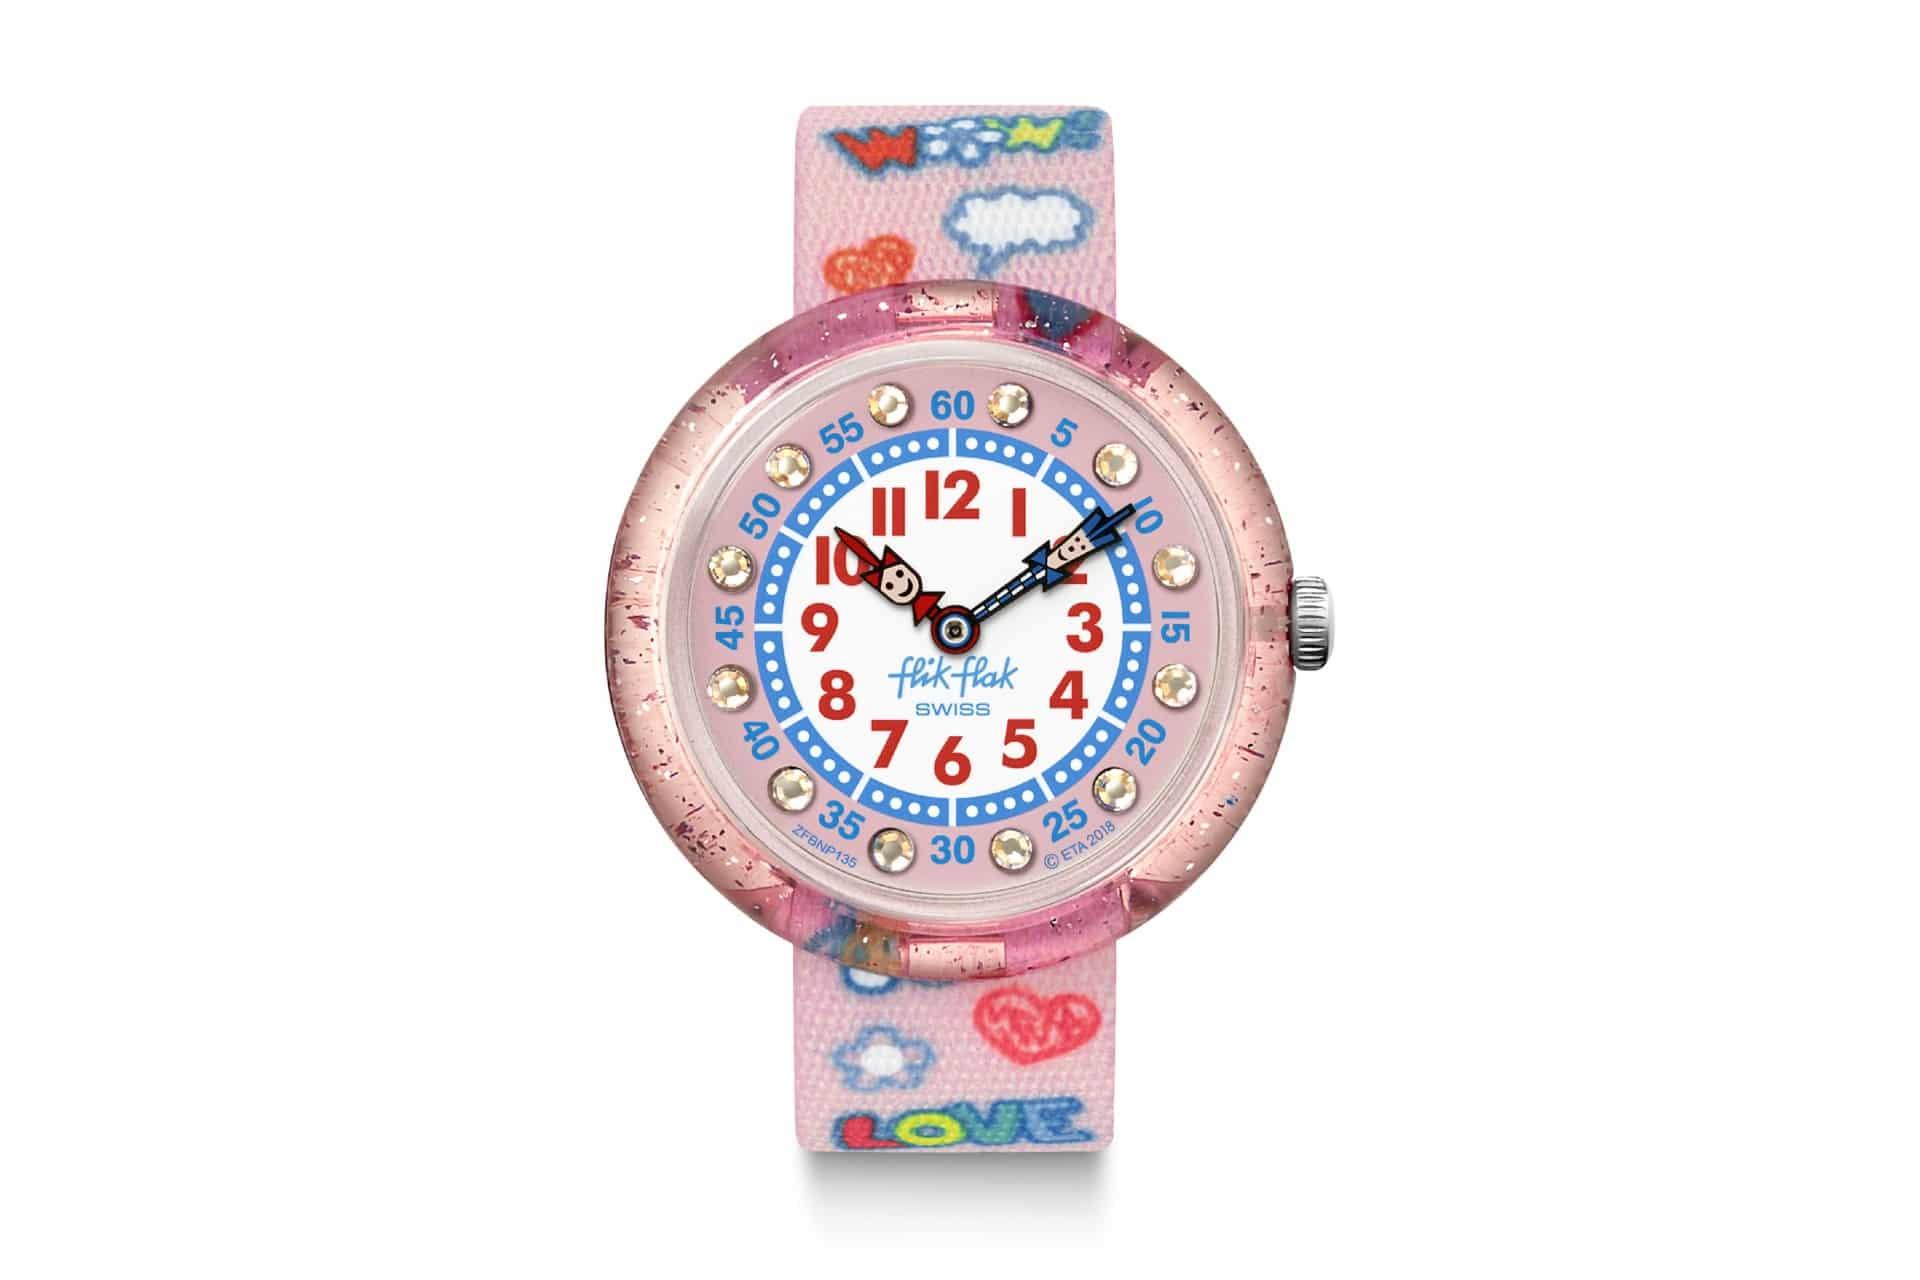 pink kids watch with pop art graphics